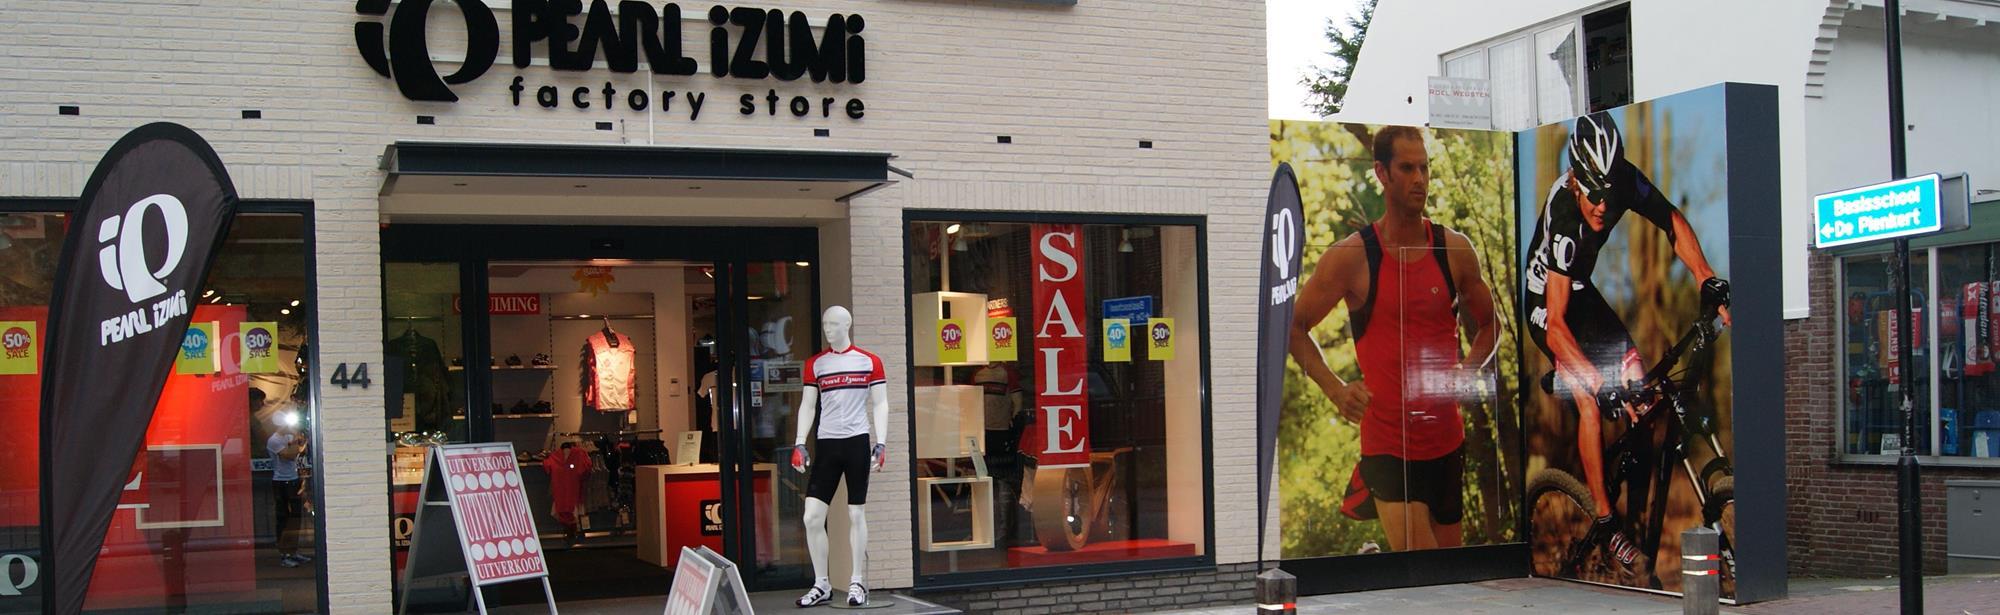 Pearl Izumi Factory Store